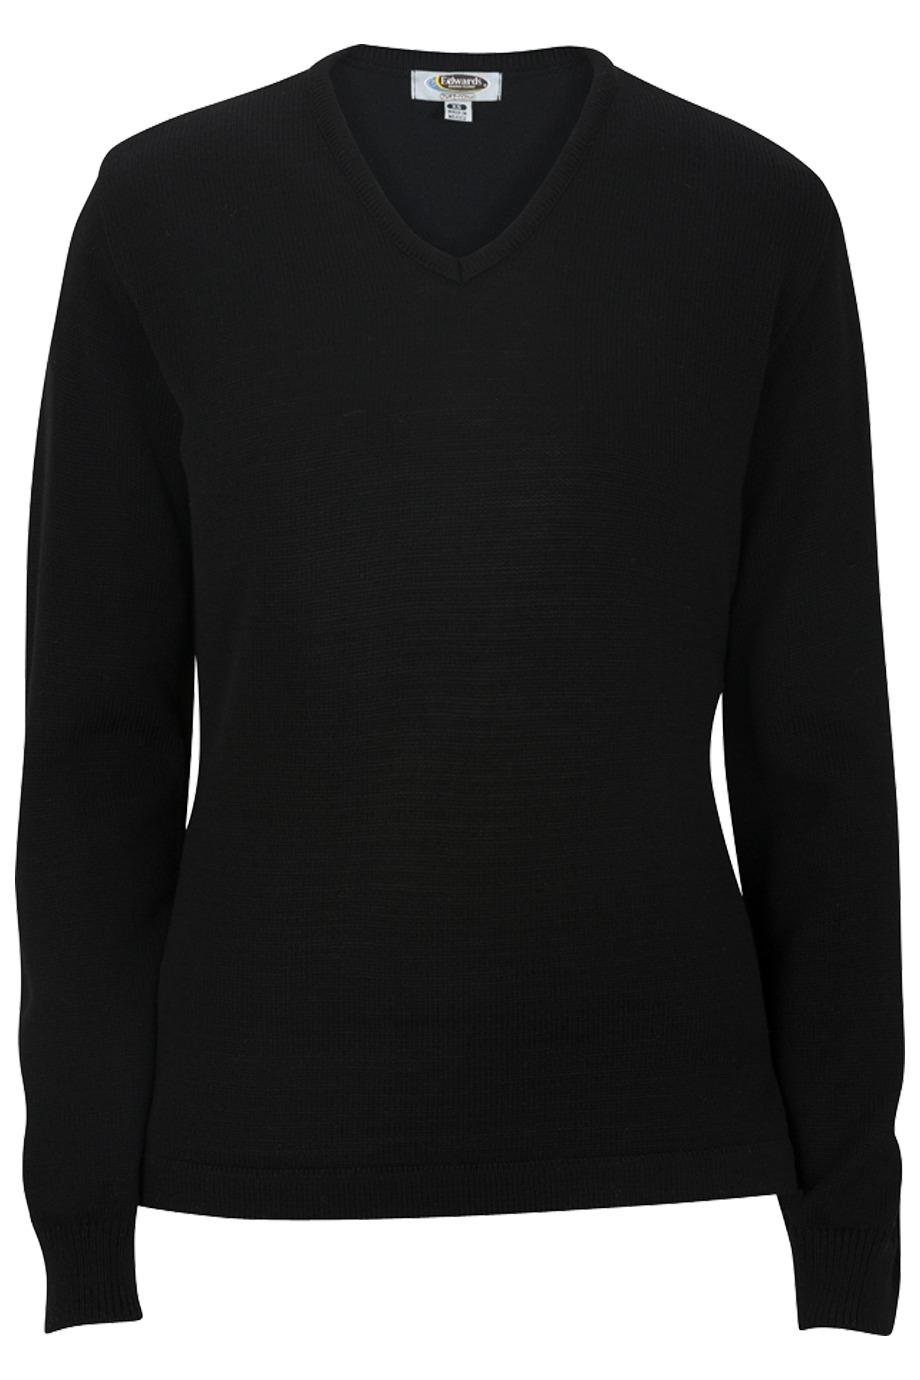 Edwards Garment 7065 - Ladies' V-Neck Sweater Tuff-Pil ...